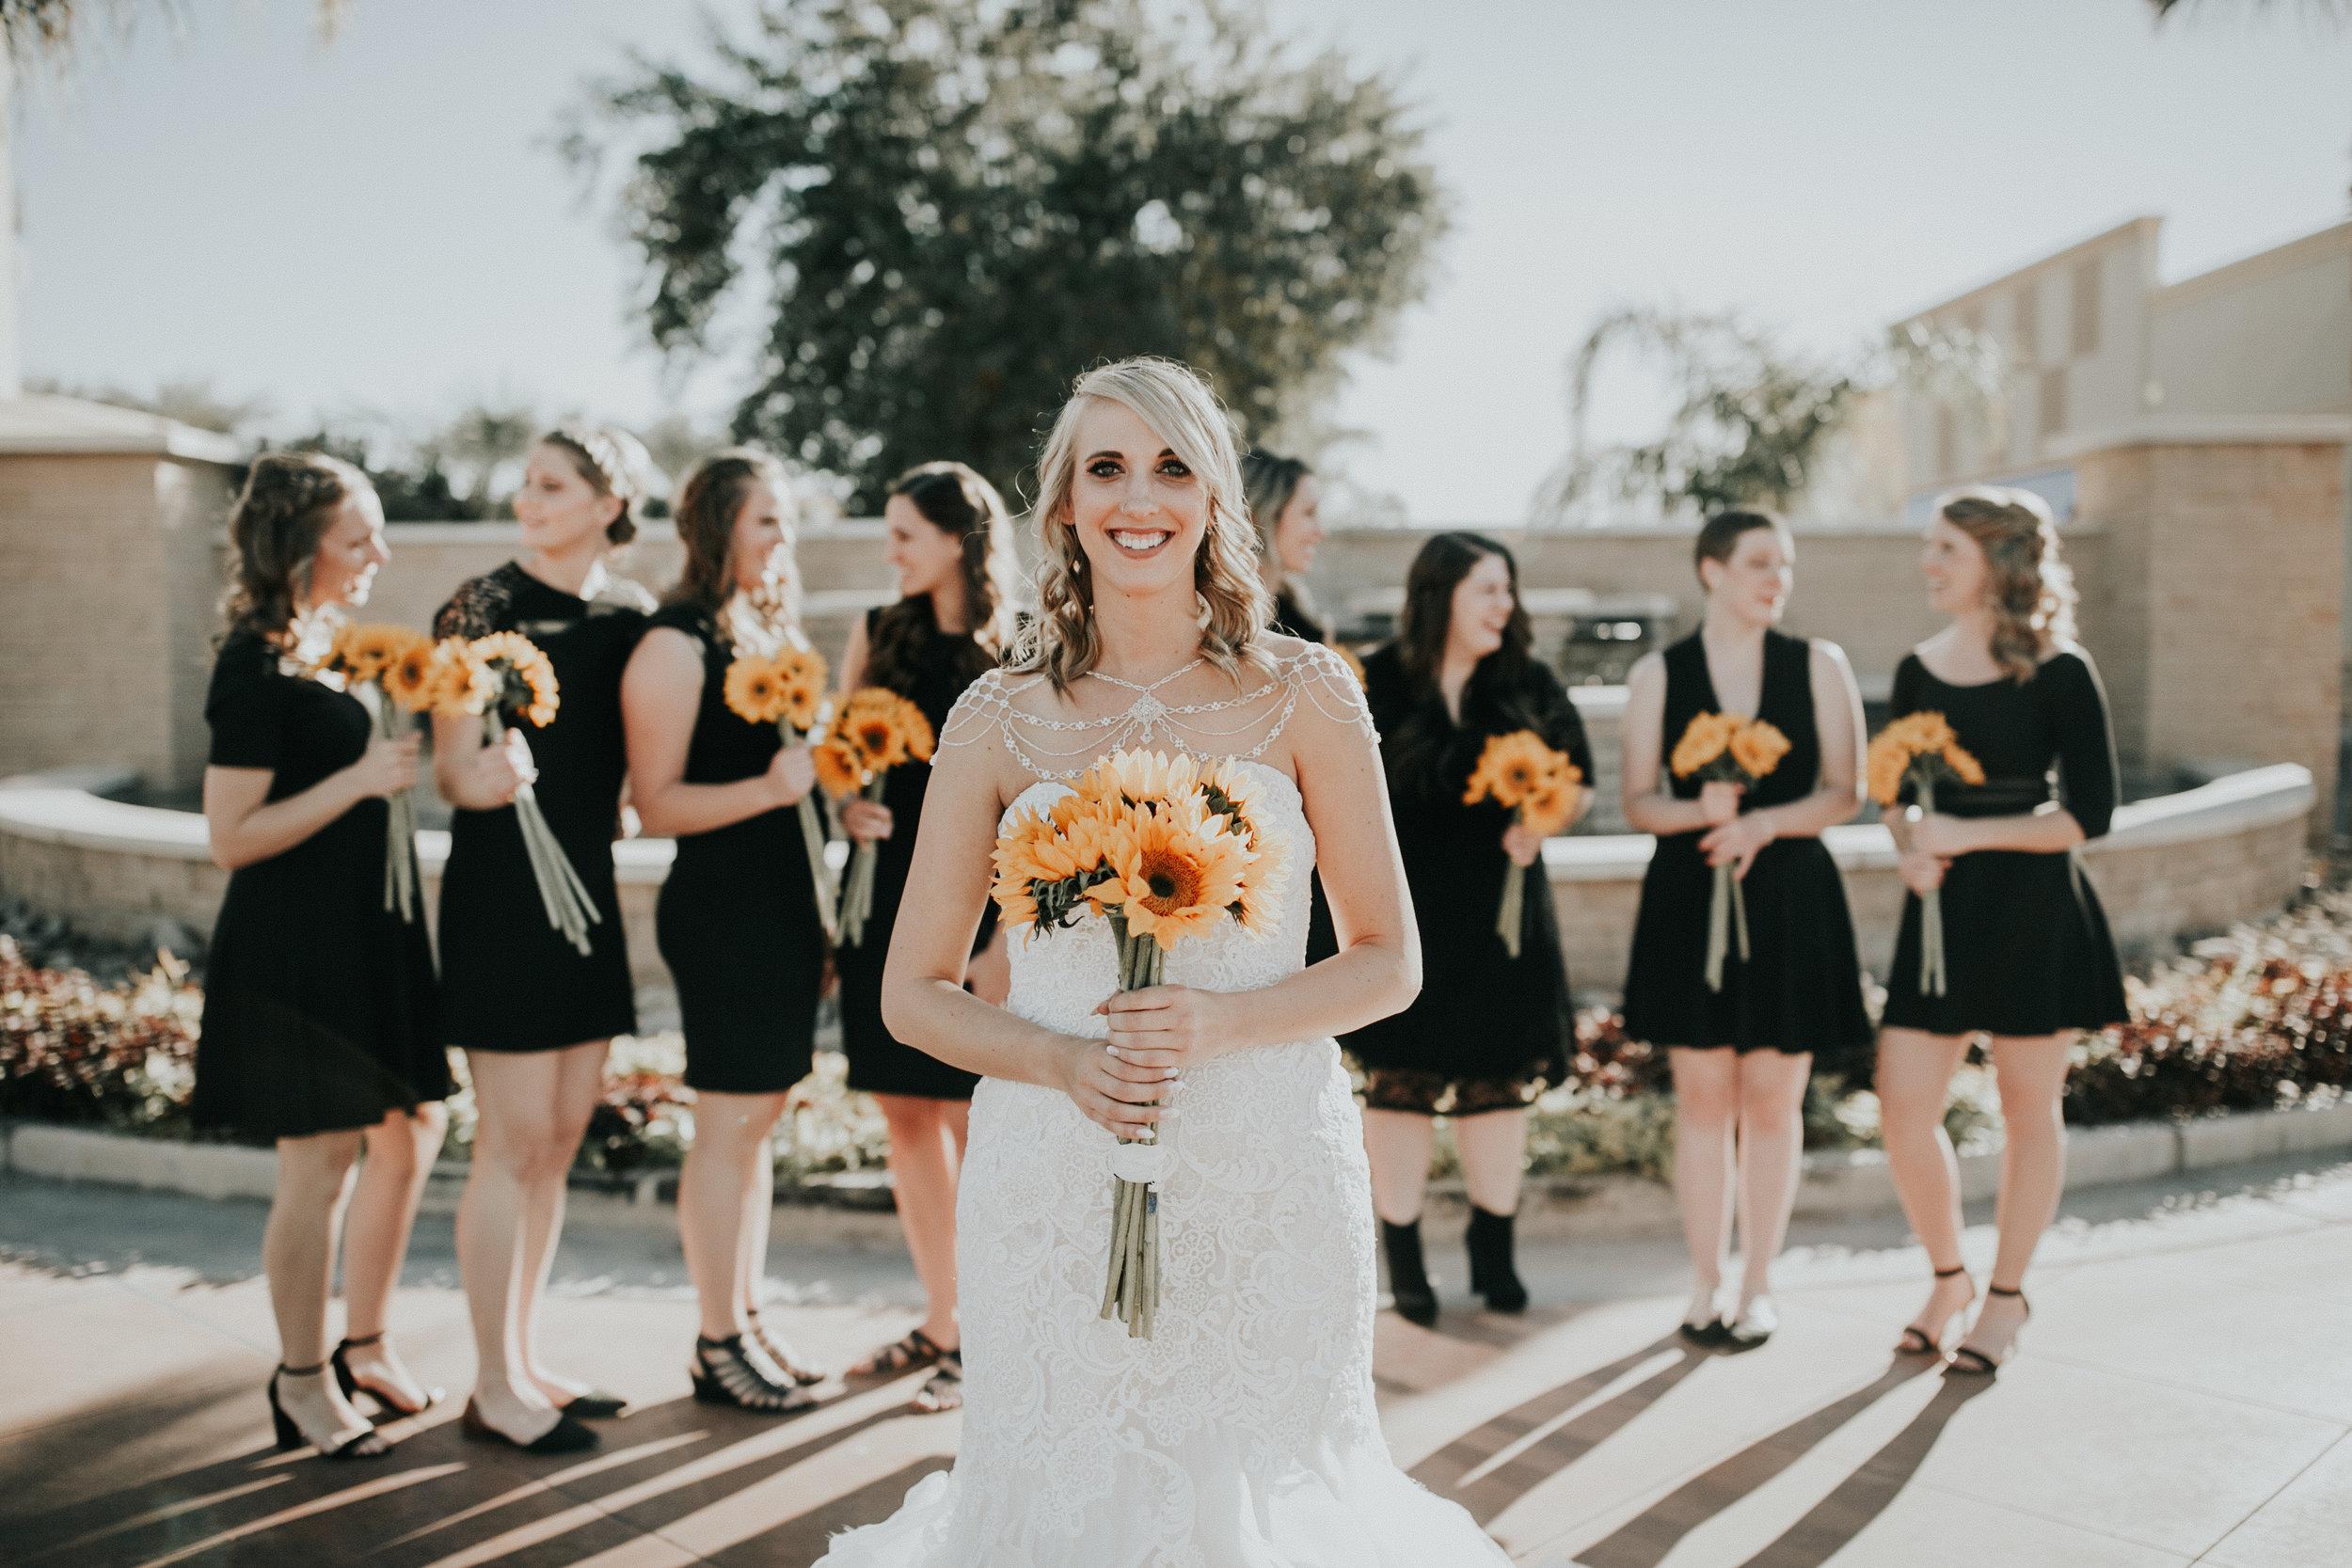 adventure-wedding-photographer-gracetphotography-22.jpg